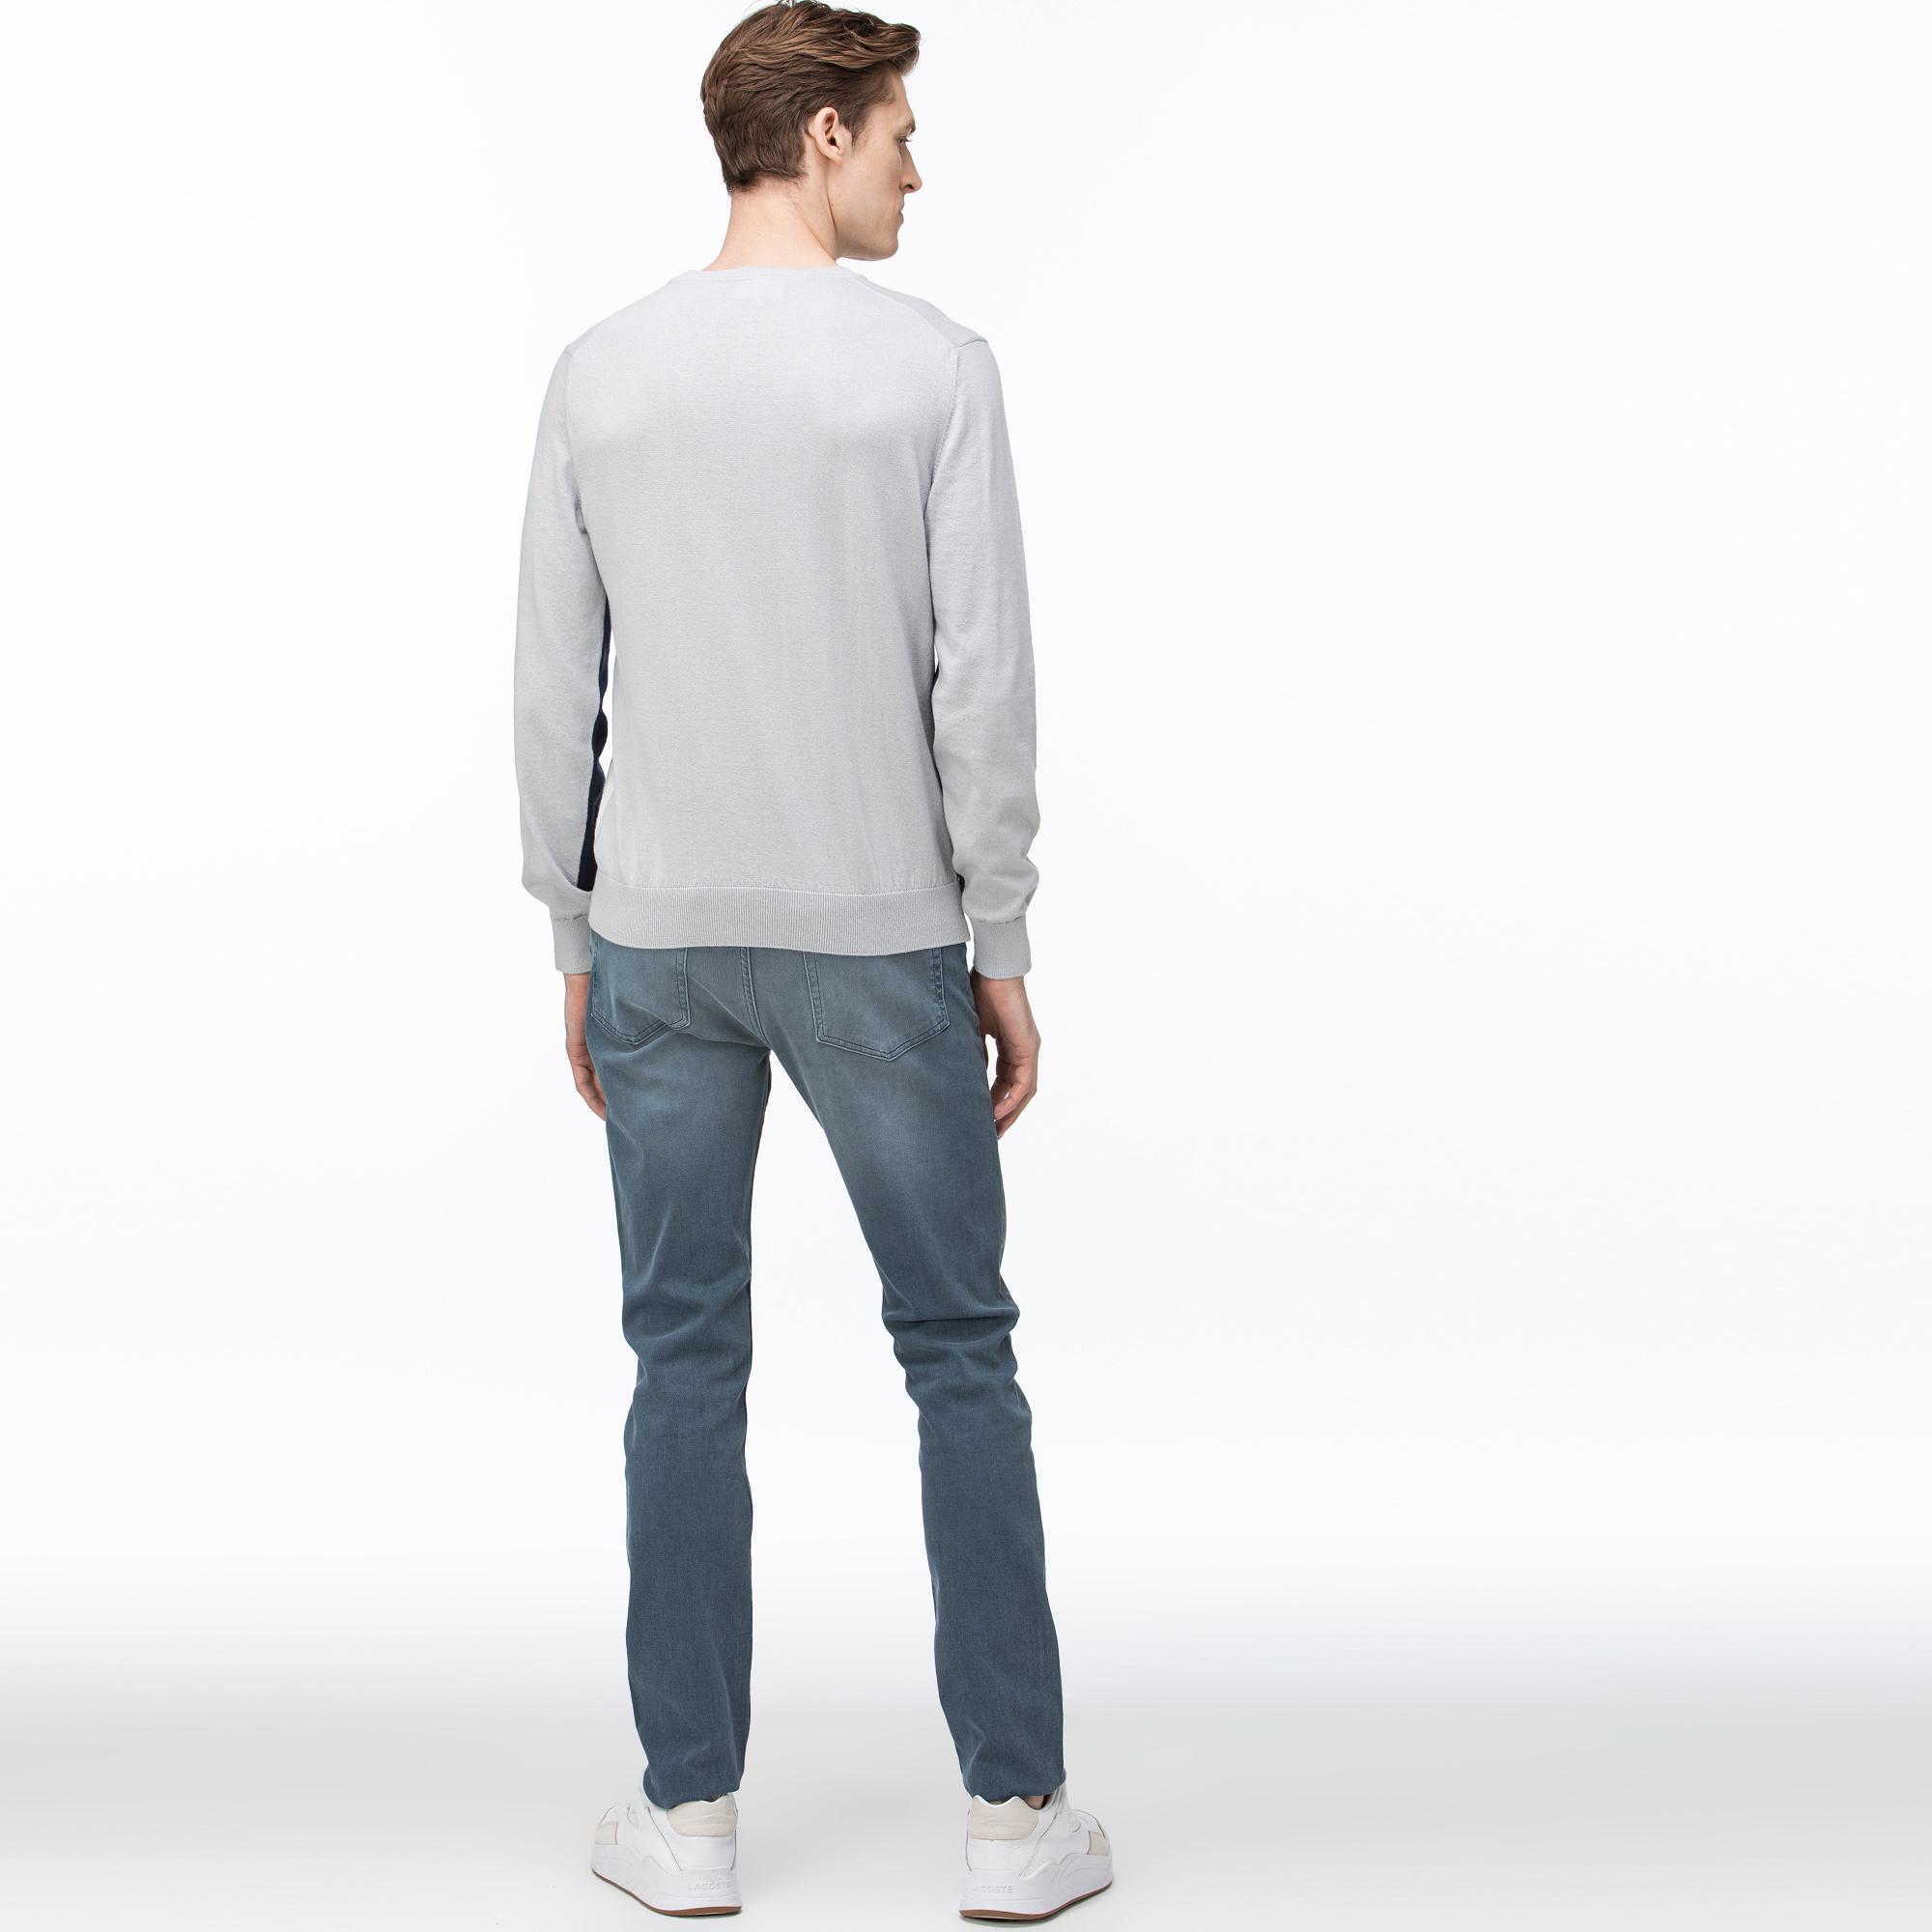 Lacoste Erkek Slim Fit Koyu Gri Pantolon